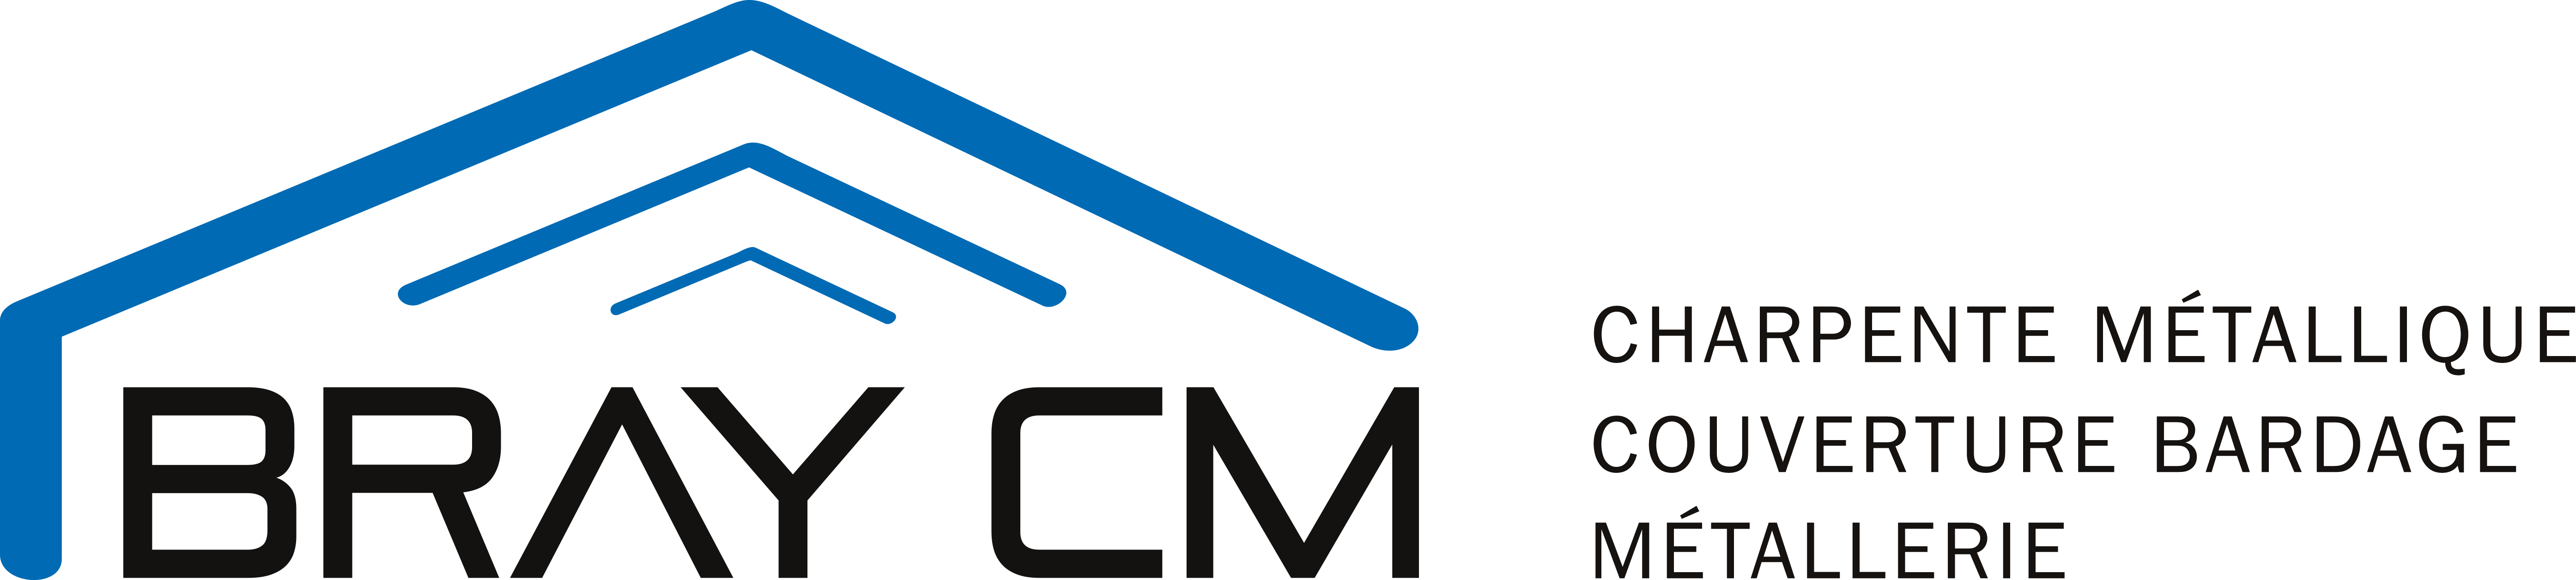 logo-bray-CM-2015-site